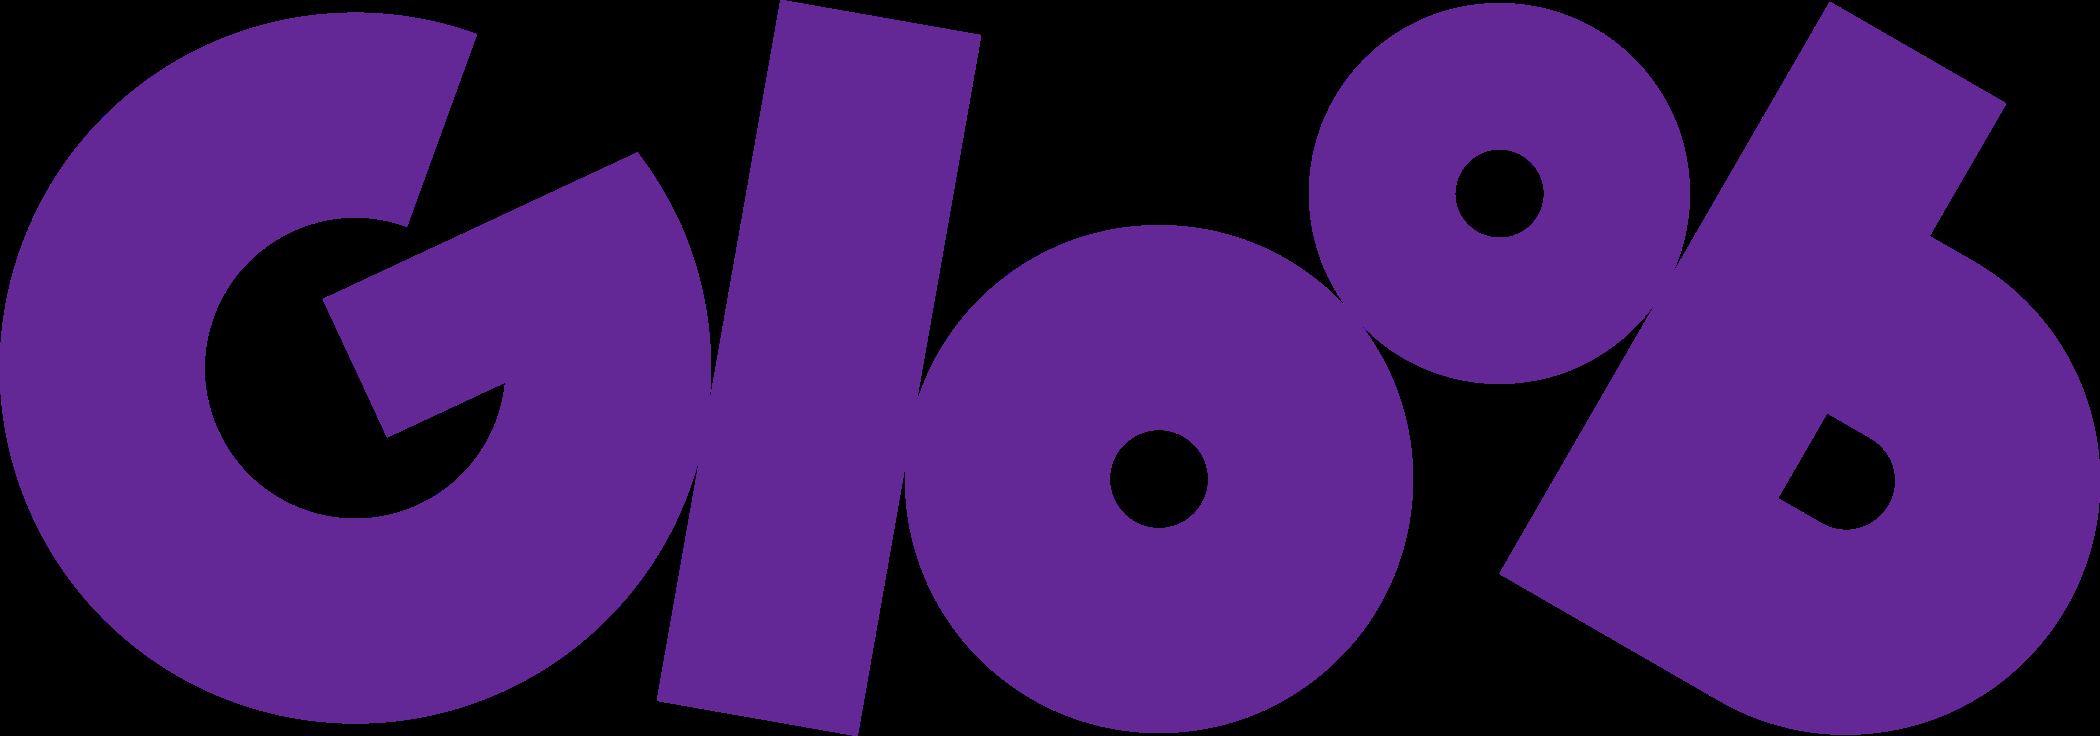 gloob logo 5 - Canal Gloob Logo